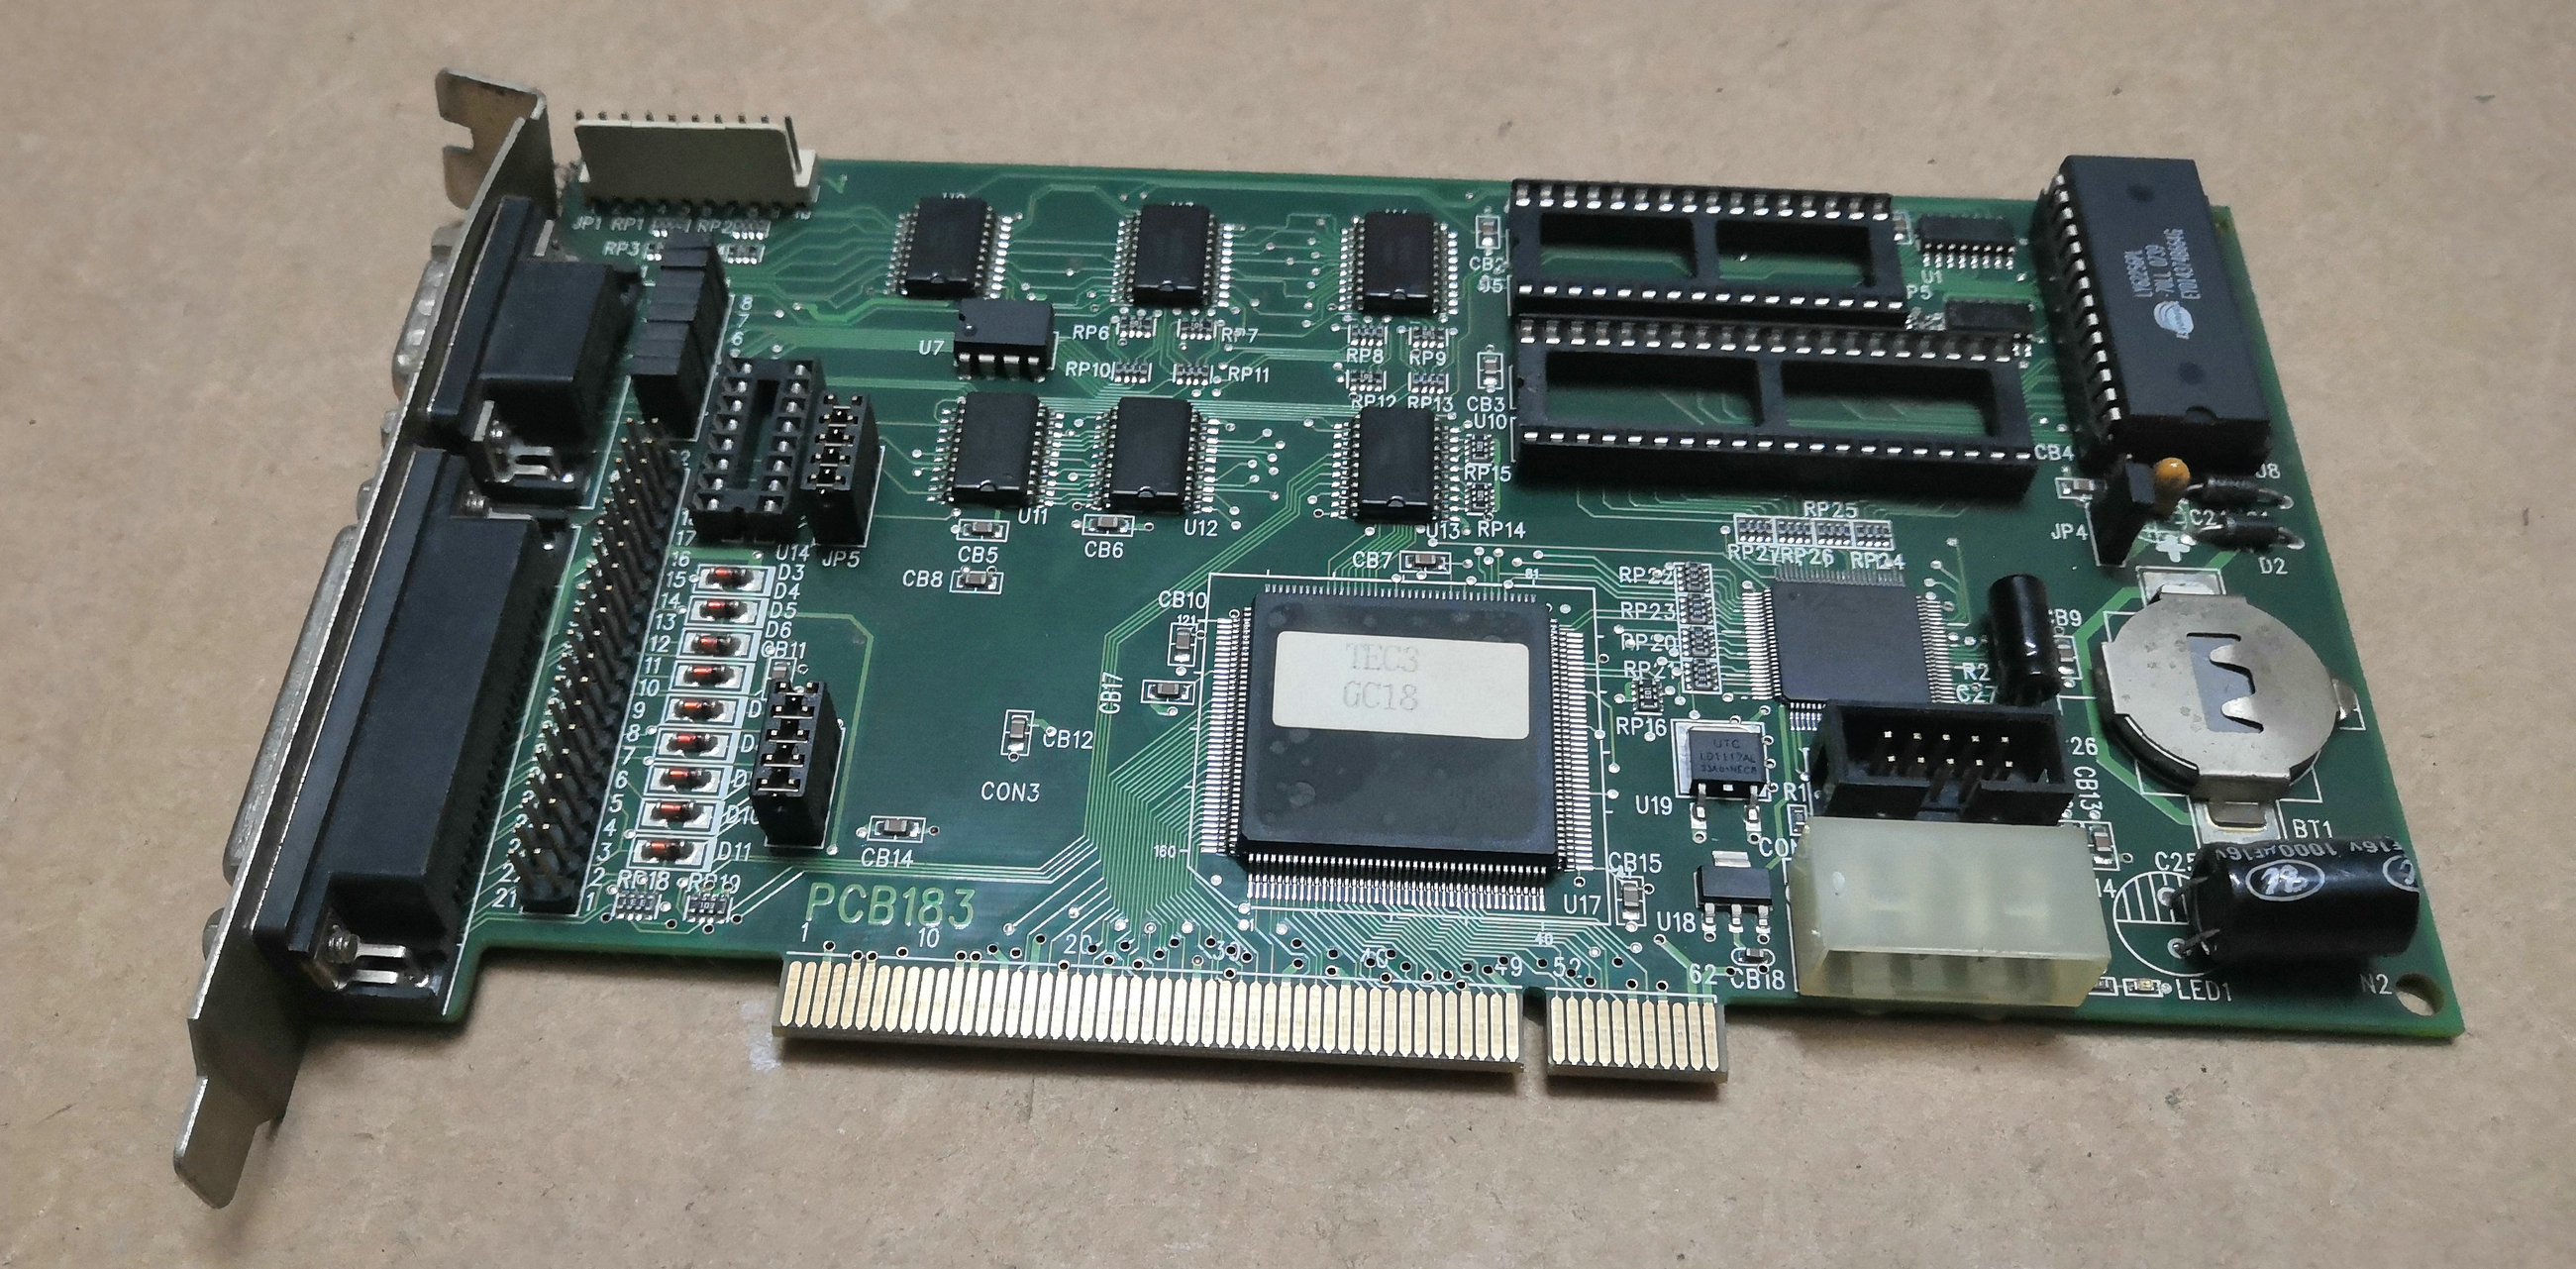 TEC4 GC18 tarjeta PCB183